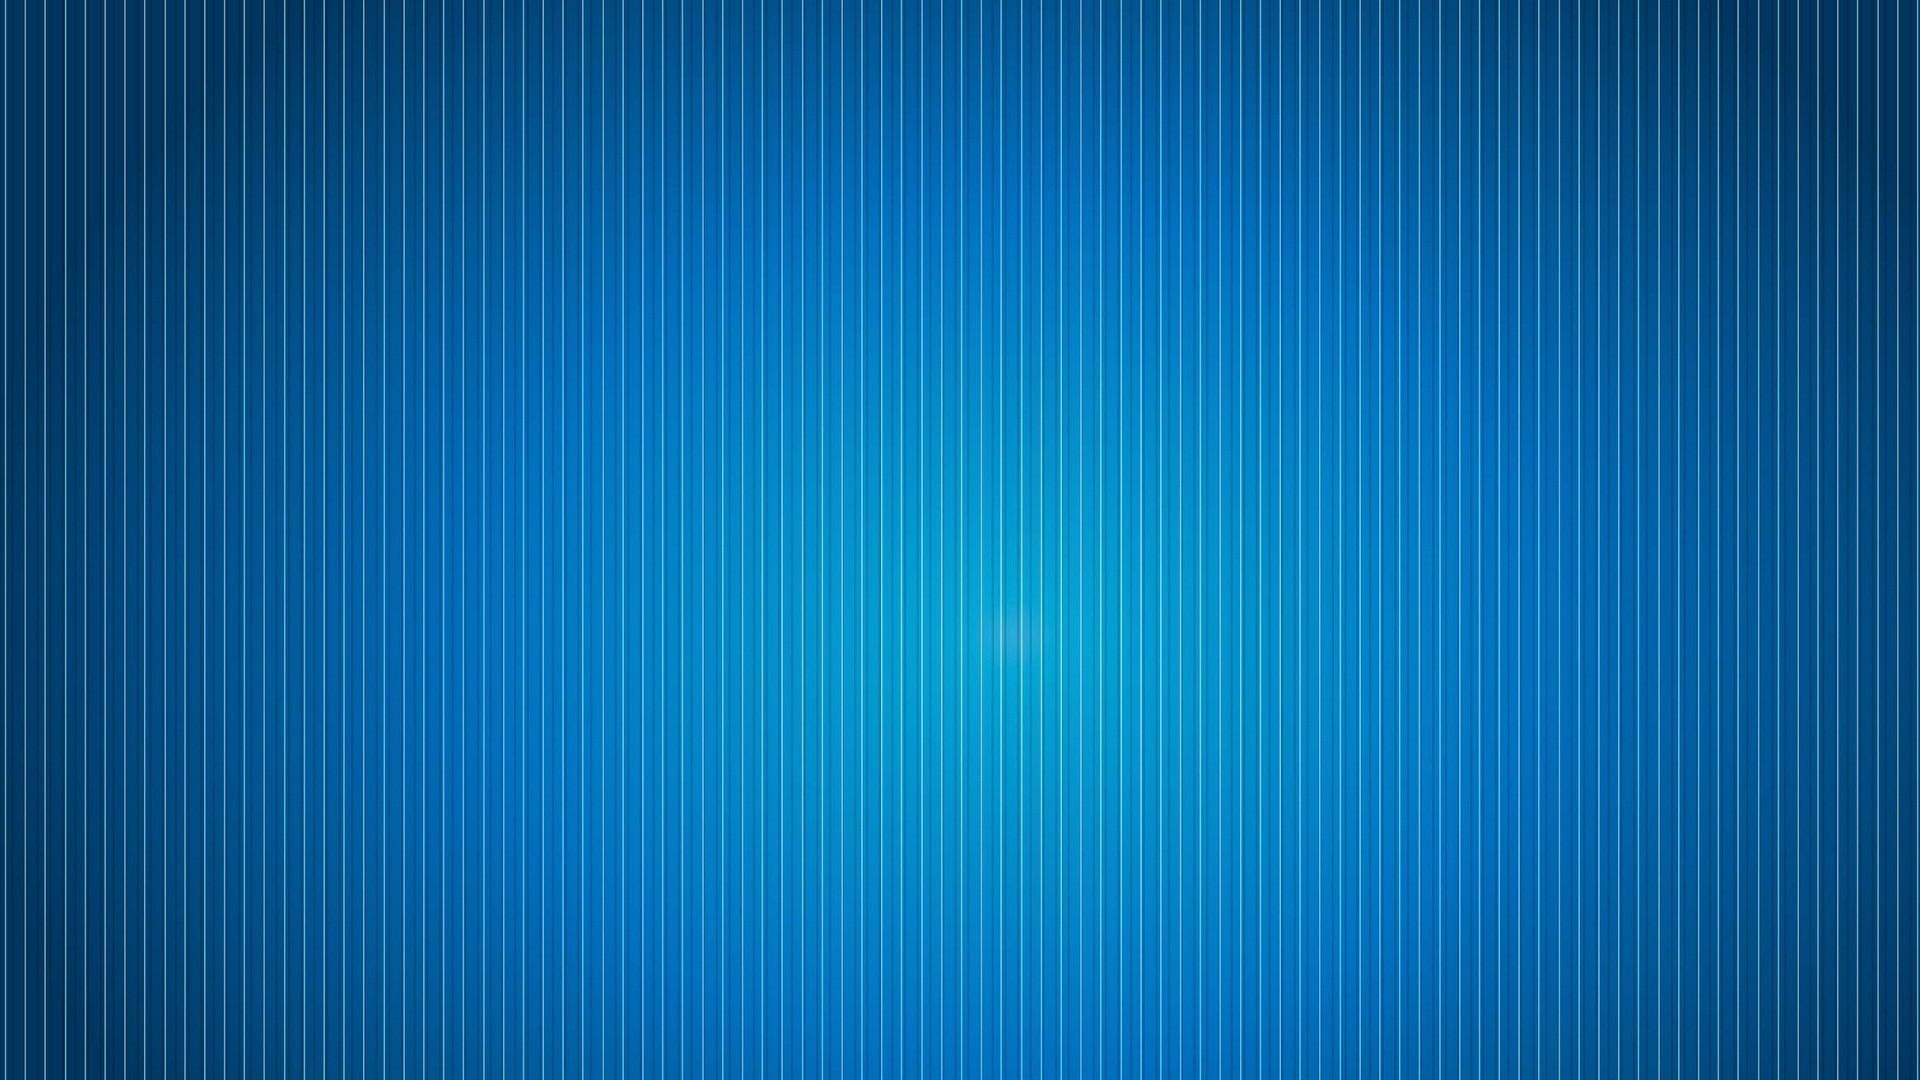 Plain Blue Pic